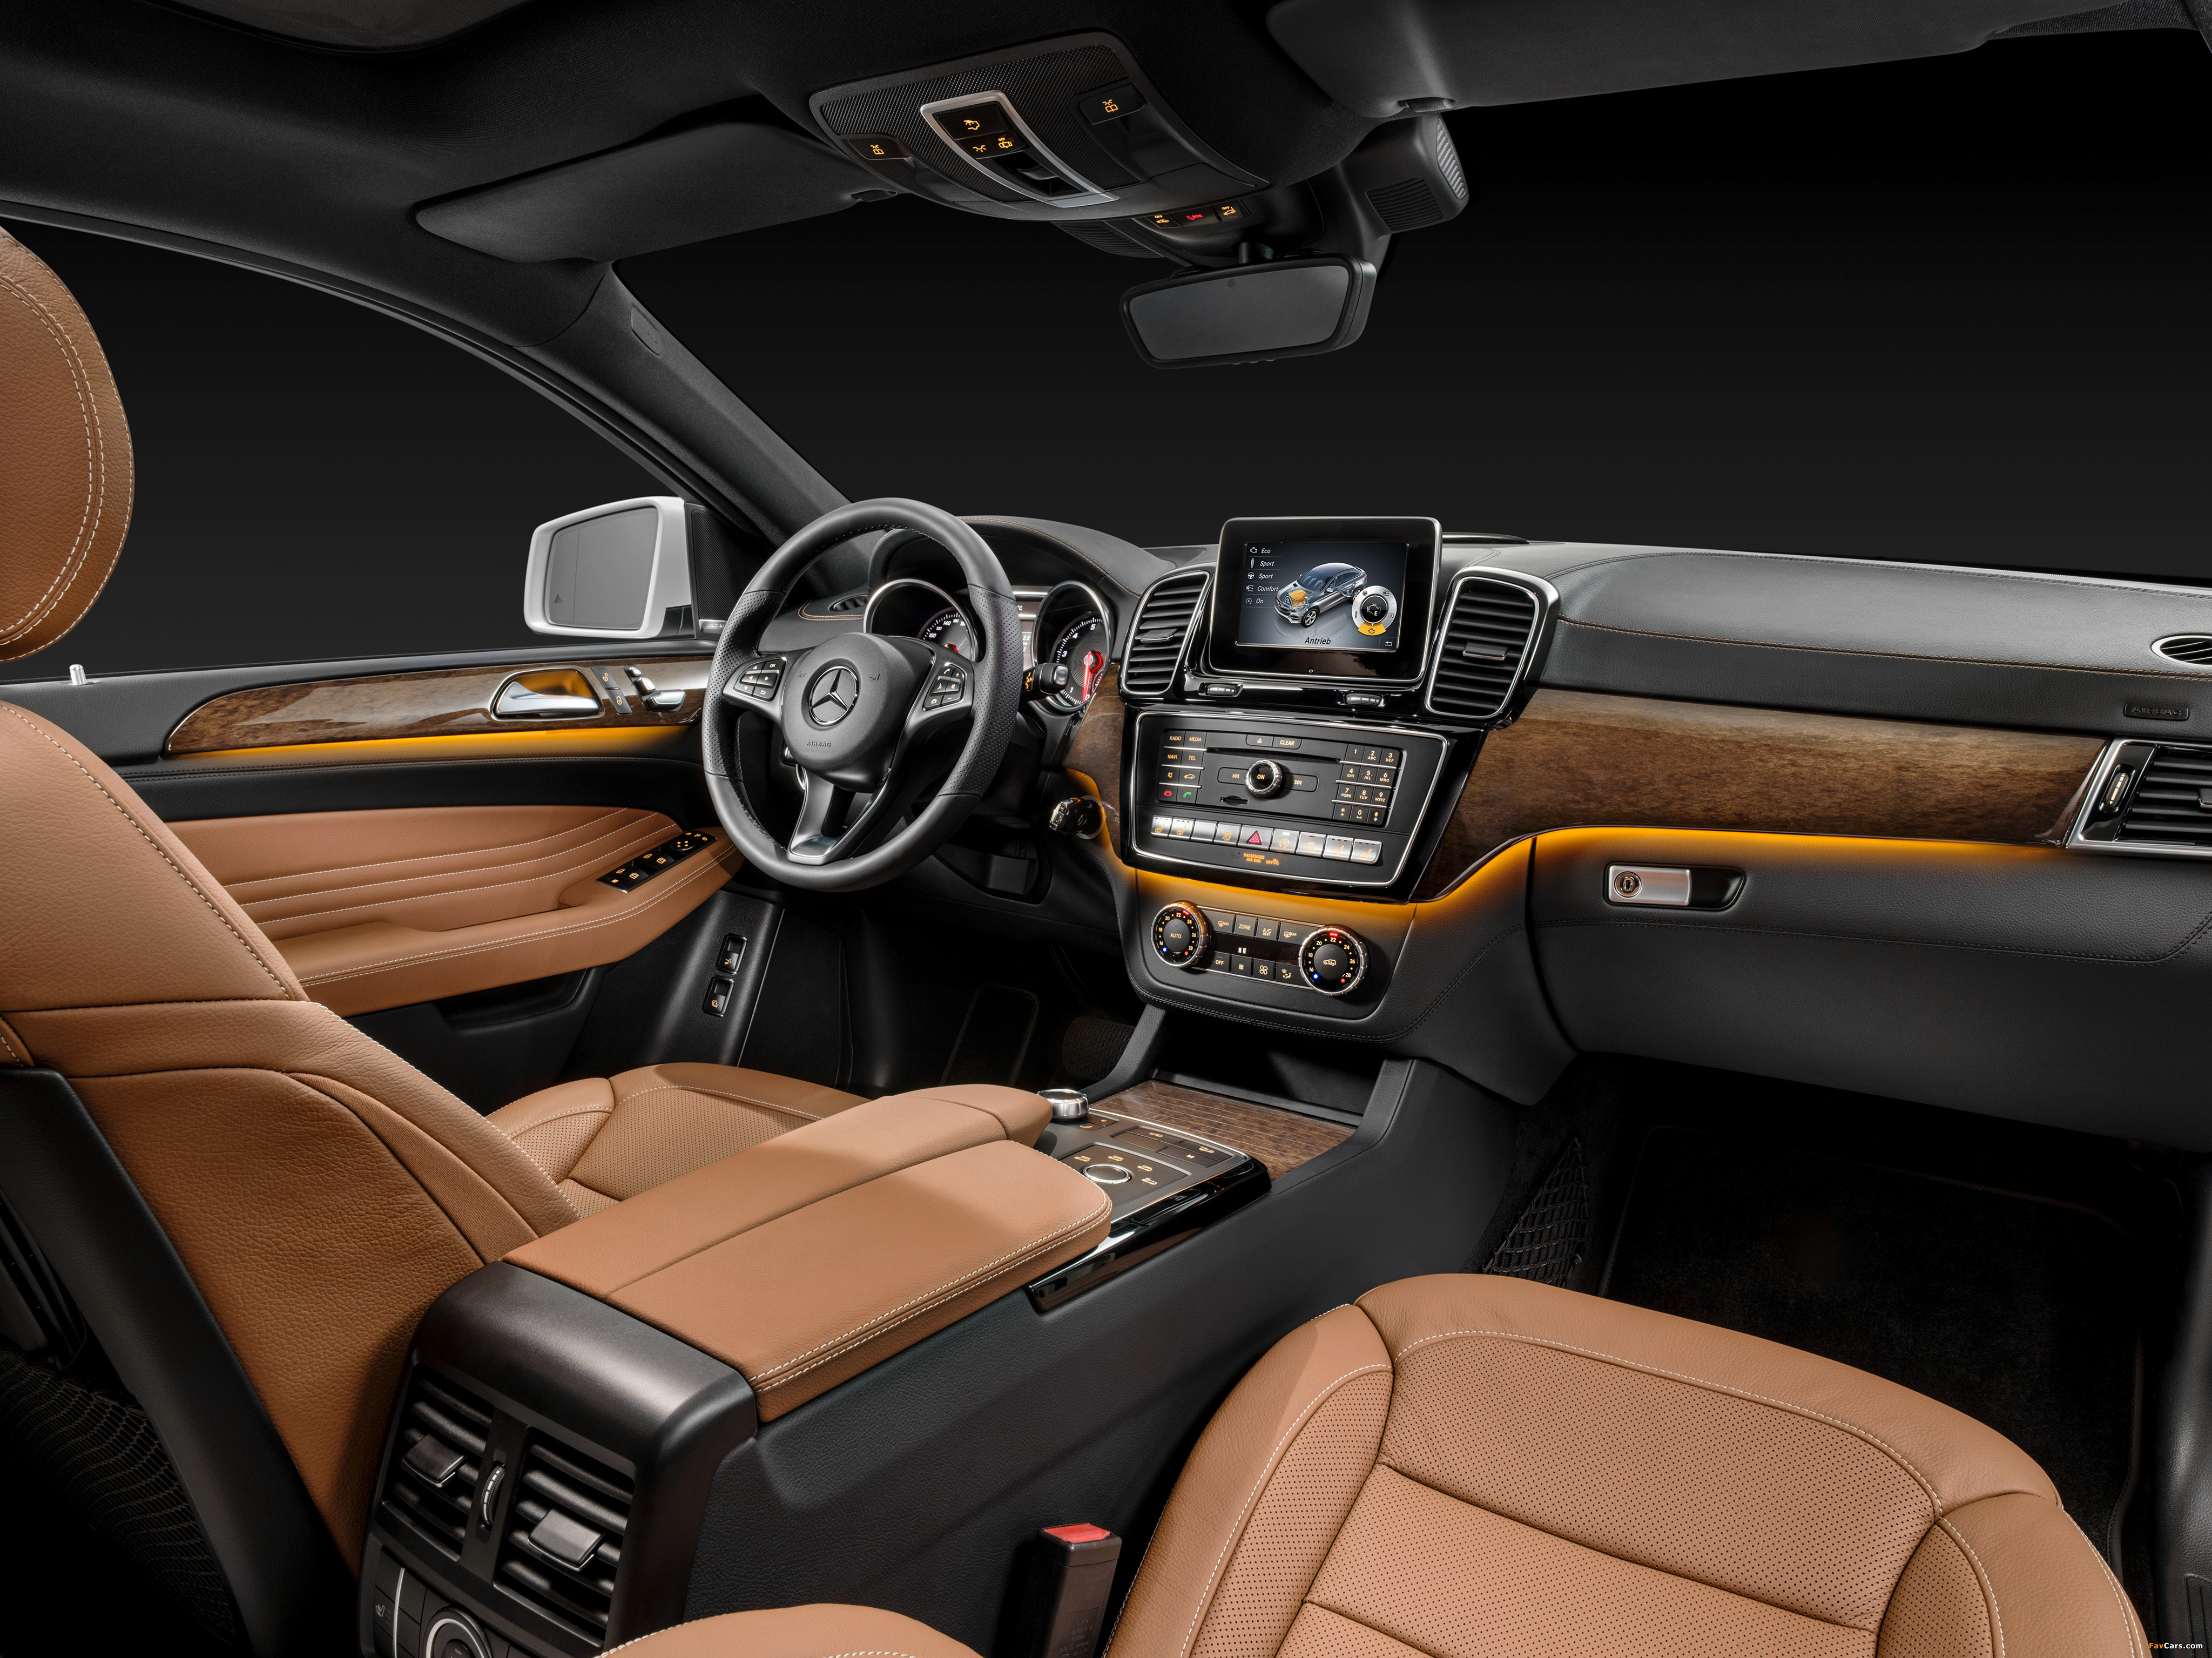 Mercedes-Benz GLE 400 4MATIC Coupé (C292) 2015 wallpapers (4096 x 3070)